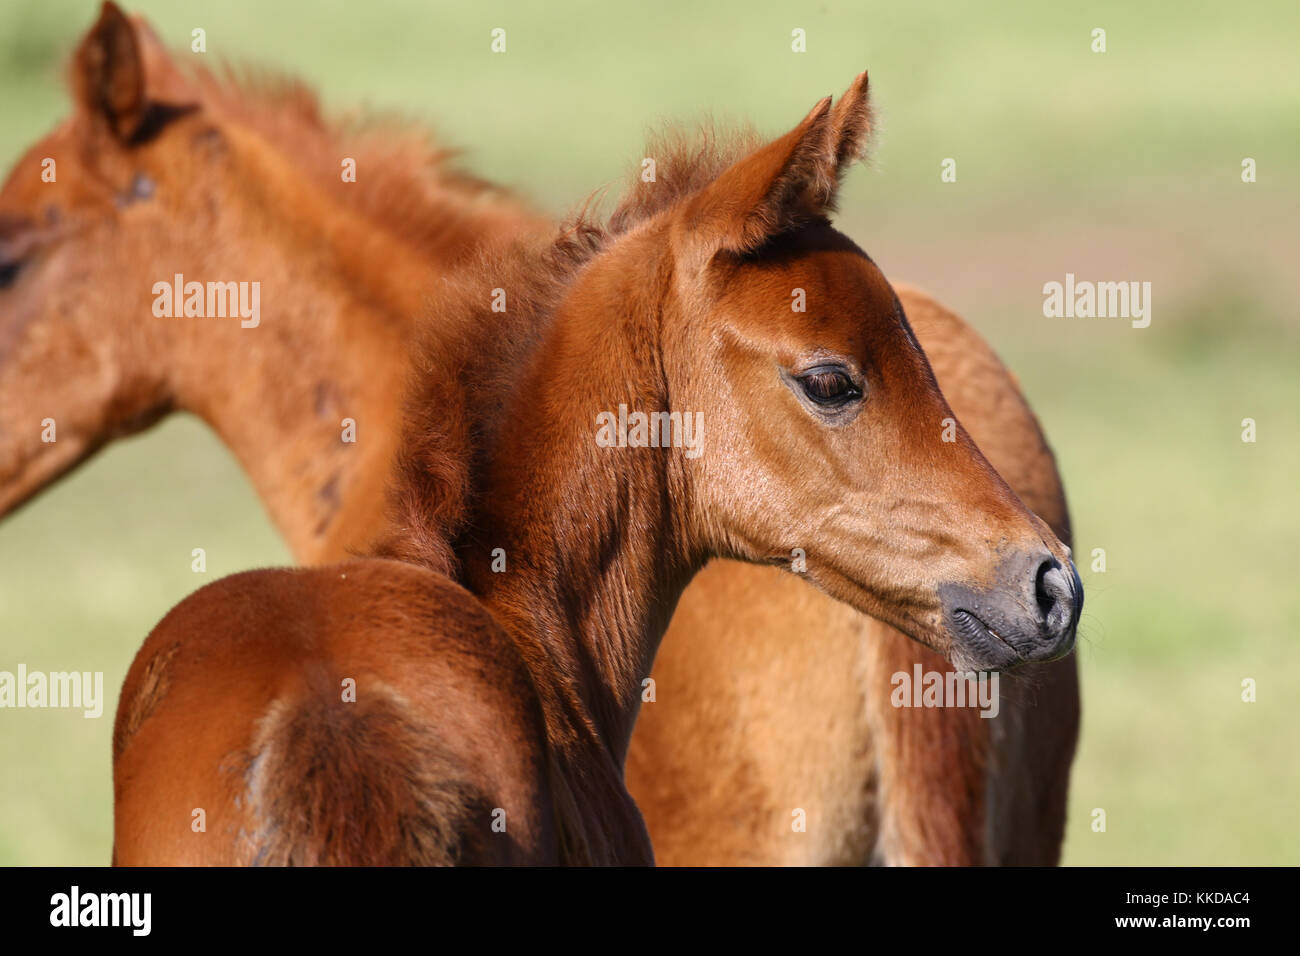 Warmblut Pferd Stockfoto